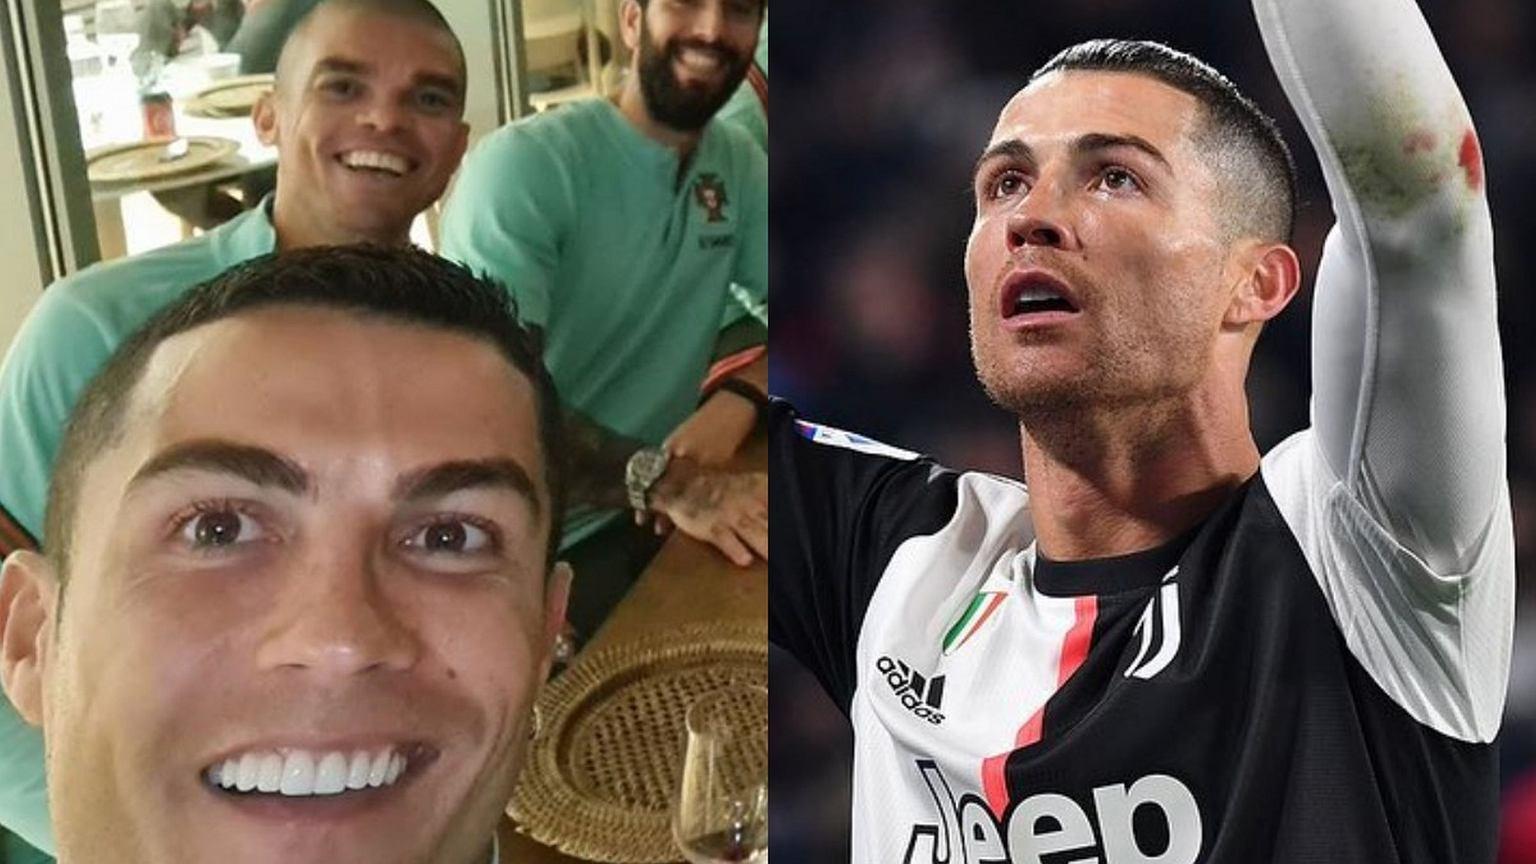 Tak Cristiano Ronaldo zareagowa